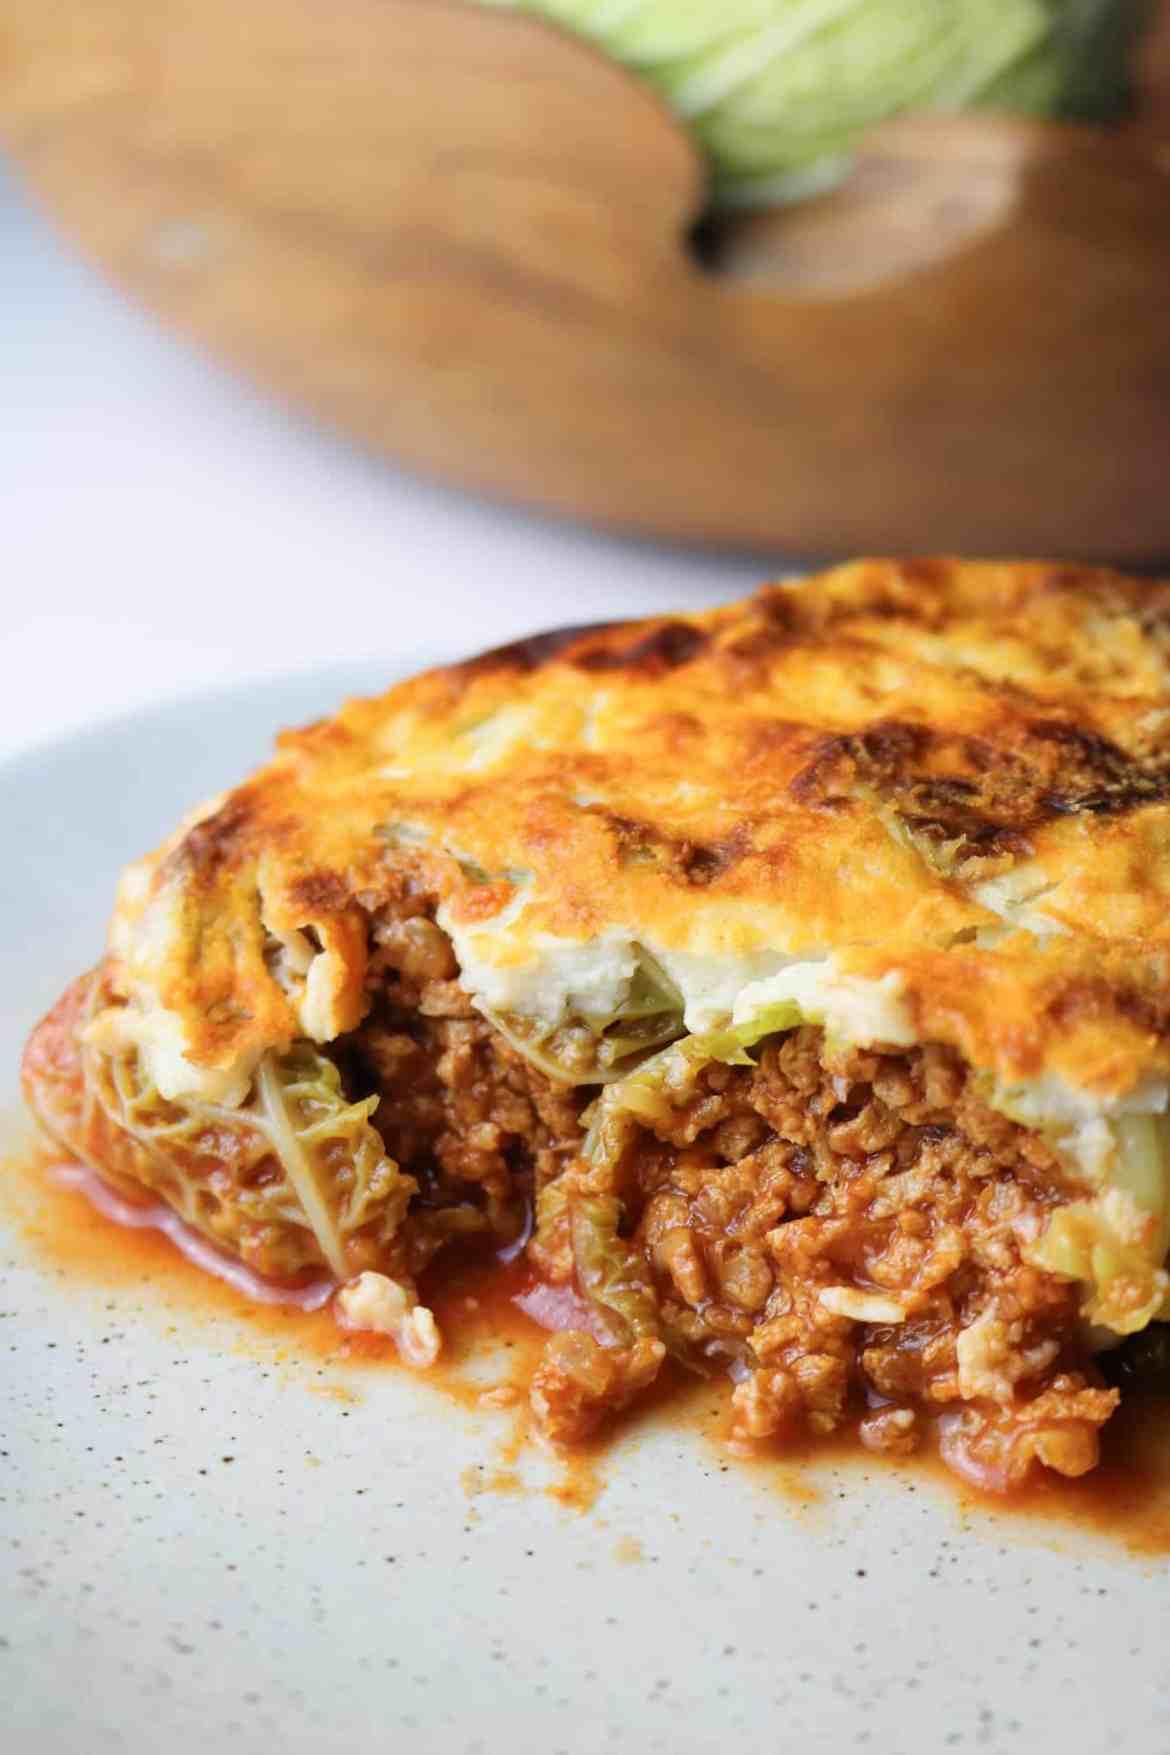 Mince Stuffed Vegan Cabbage Rolls close up